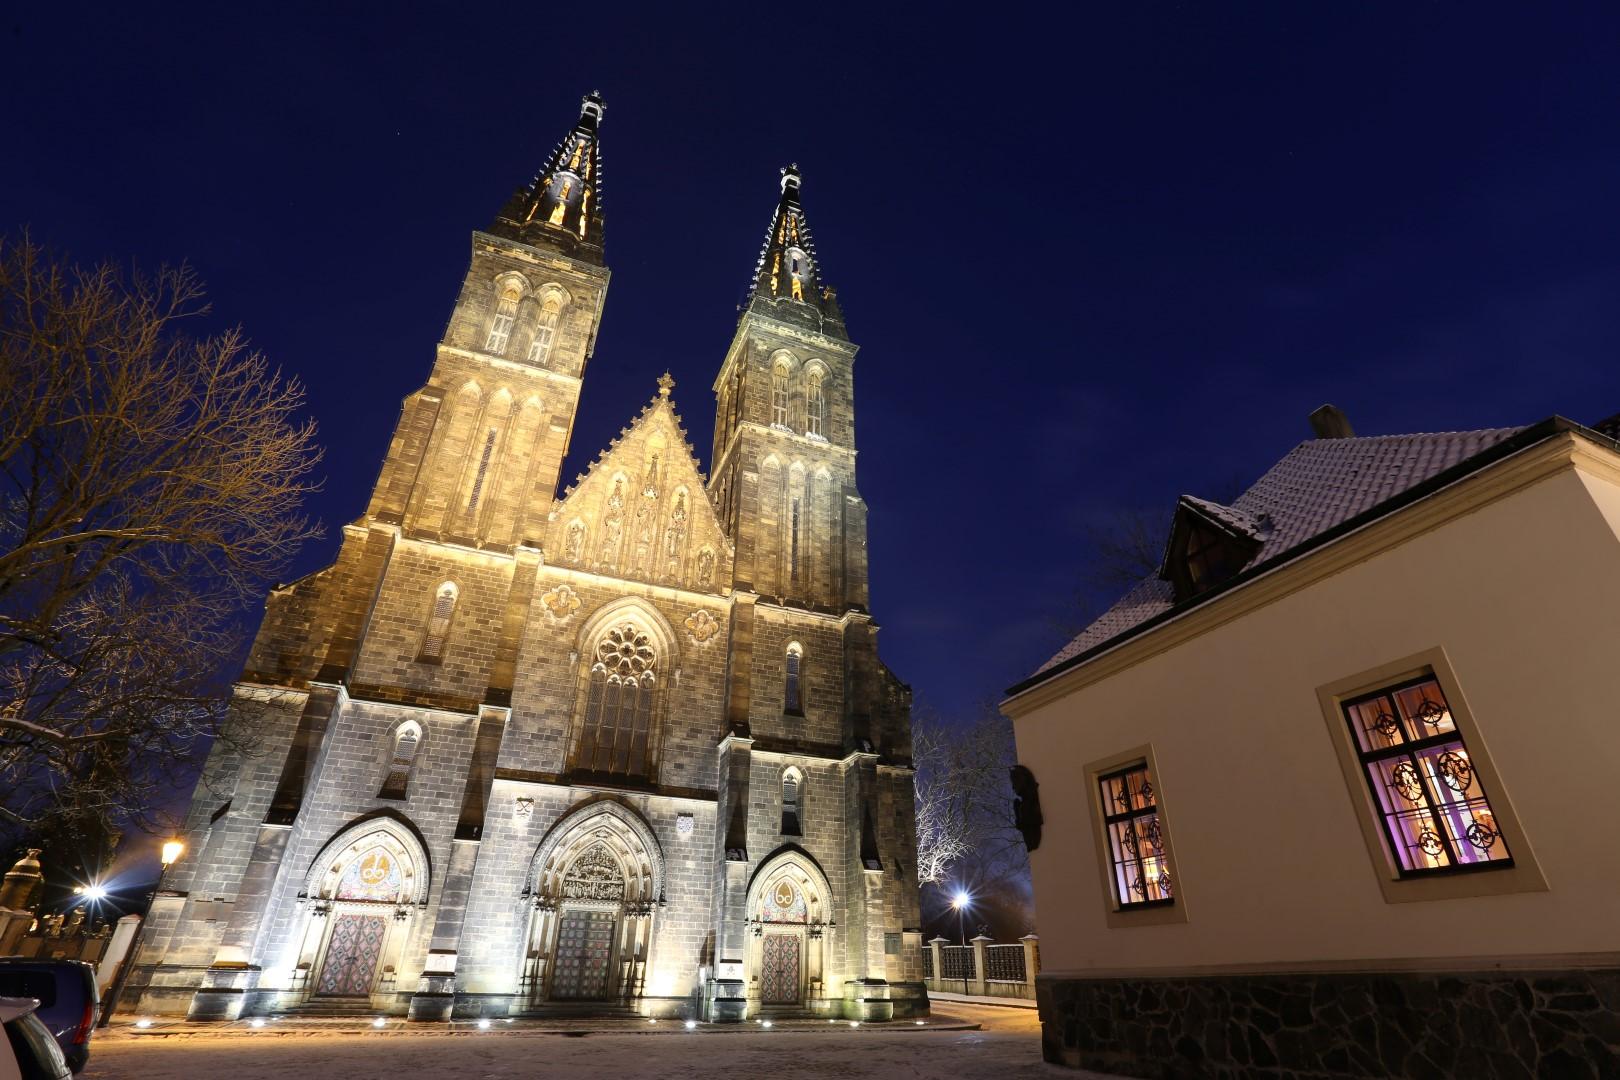 Bazilika sv. Petra a Pavla Vyšehrad